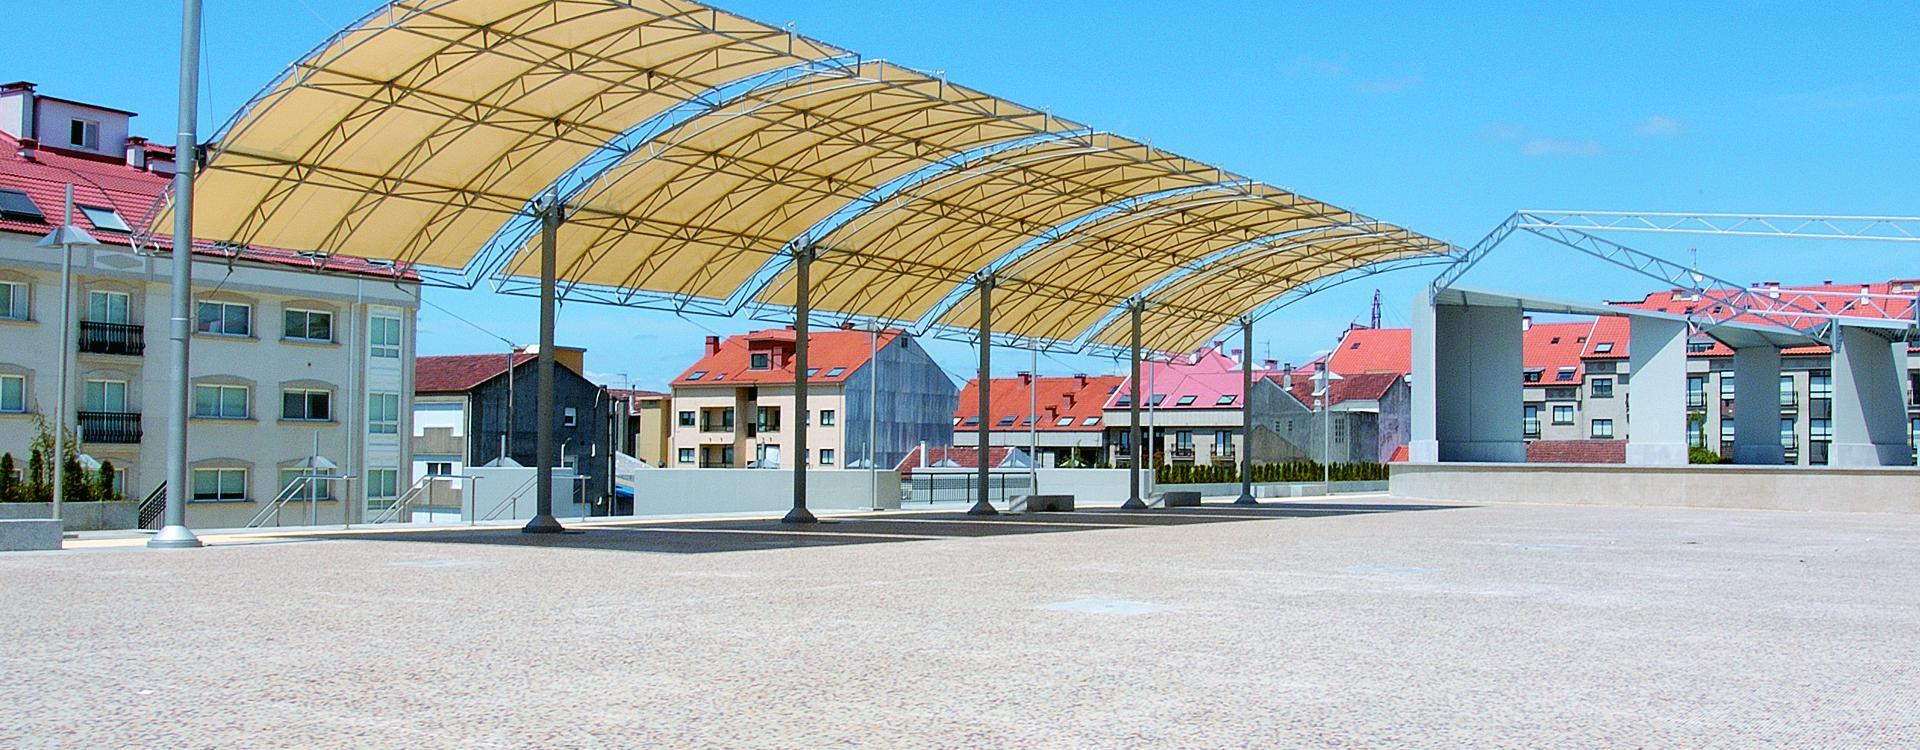 Plaza y parking Europa, Lalín - Galicia Spain